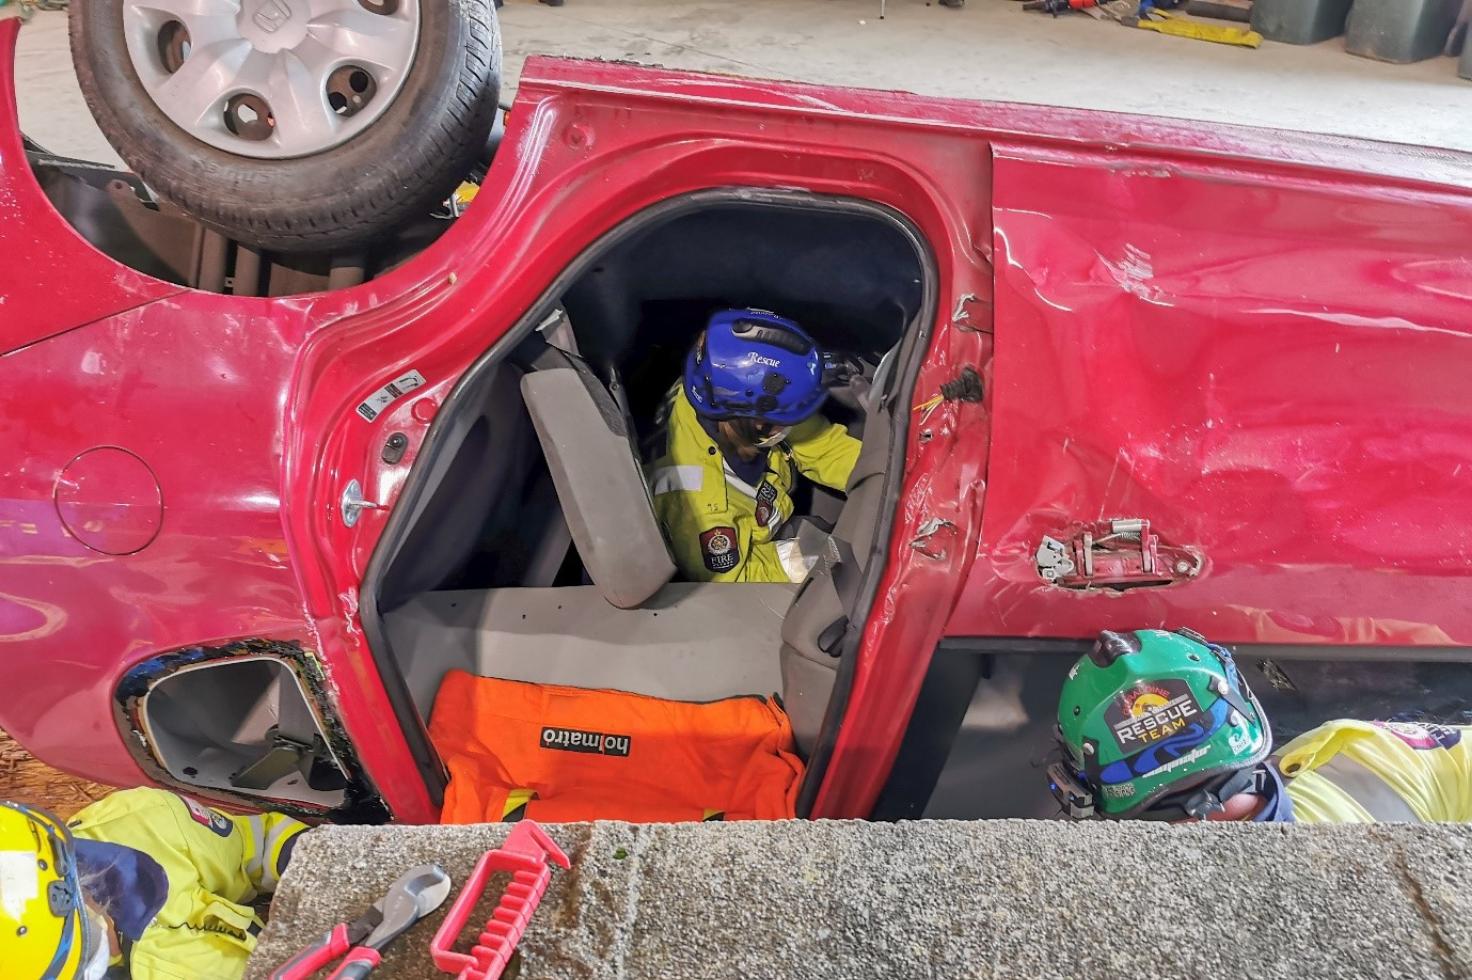 Volunteer fire fighters practise life saving skills